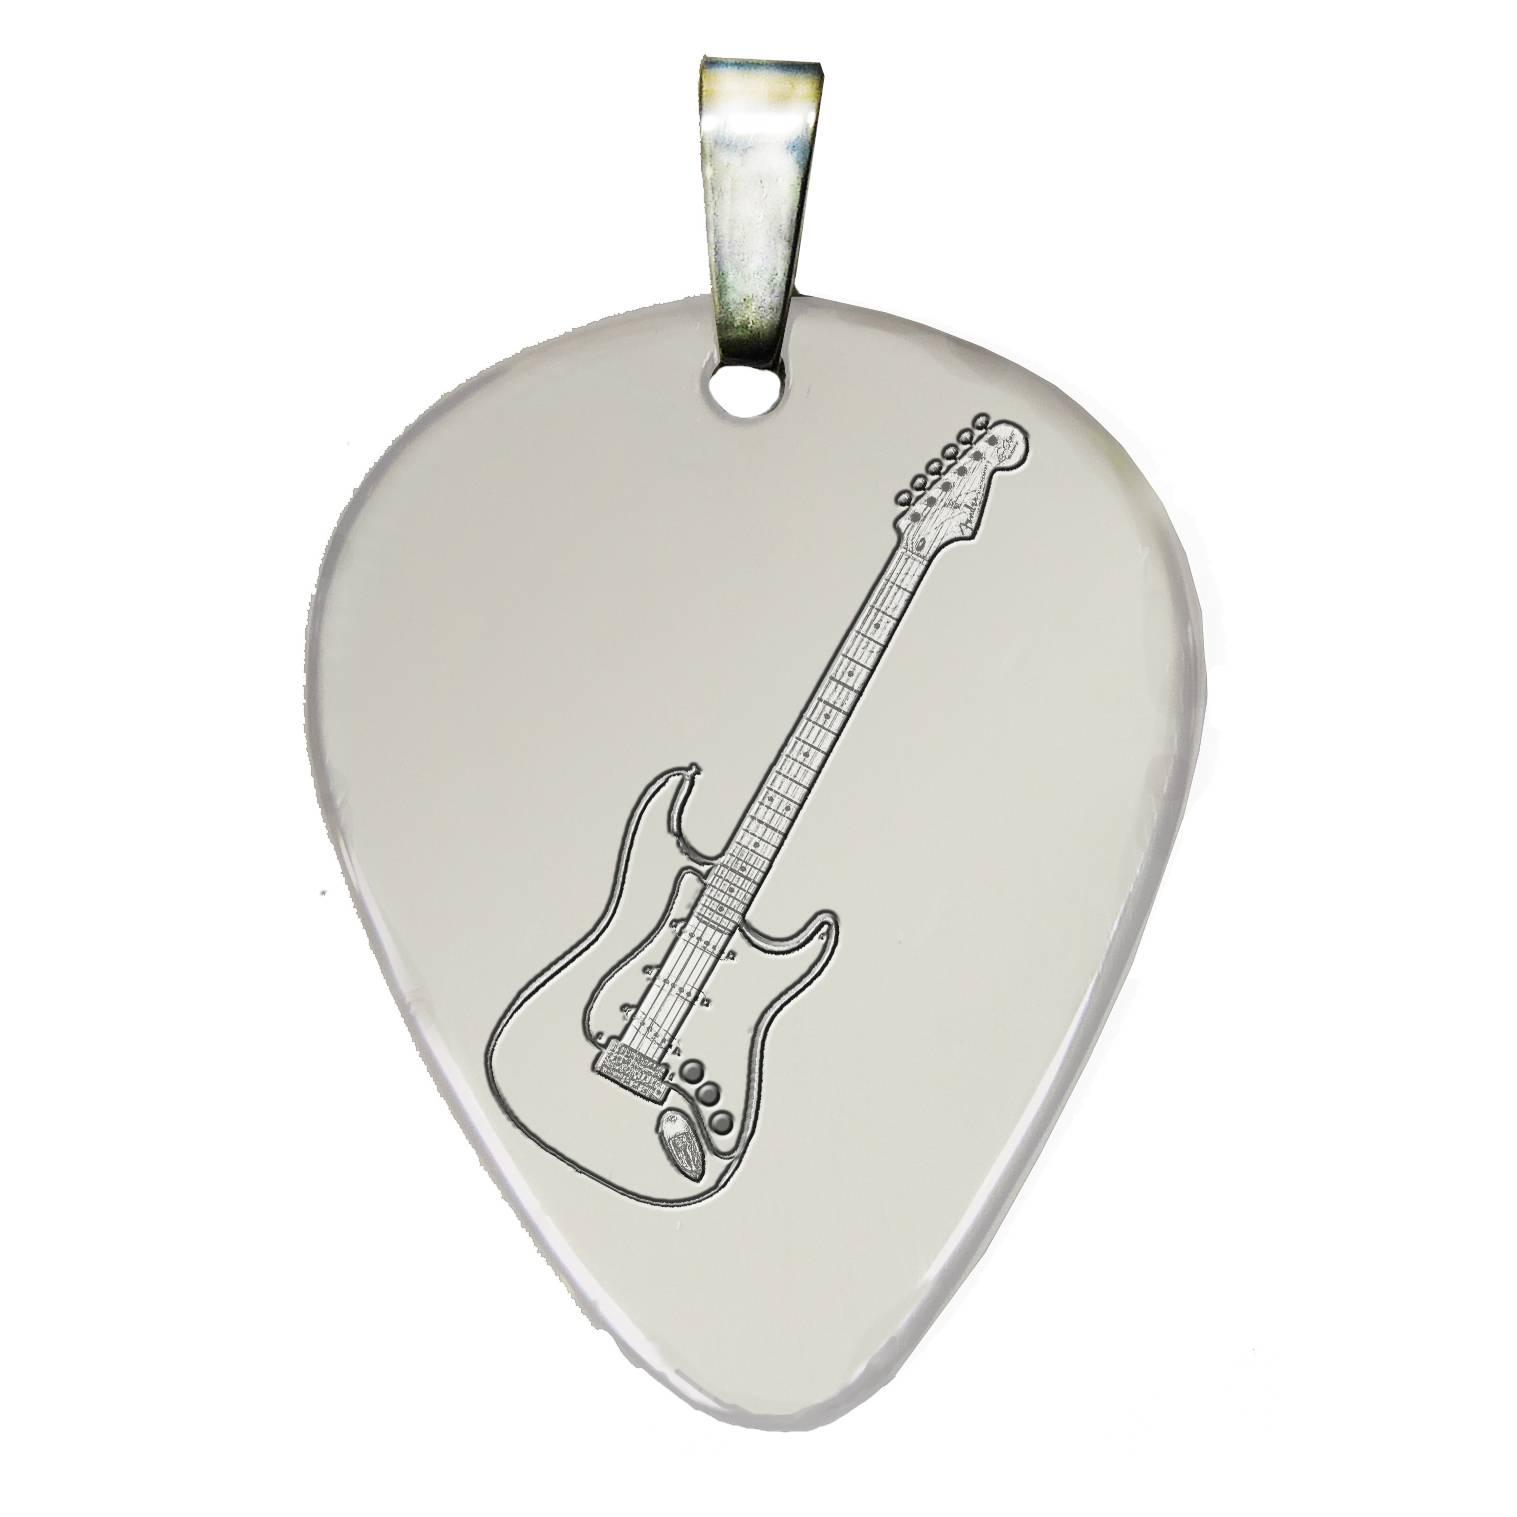 púa de guitarra con guitarra2